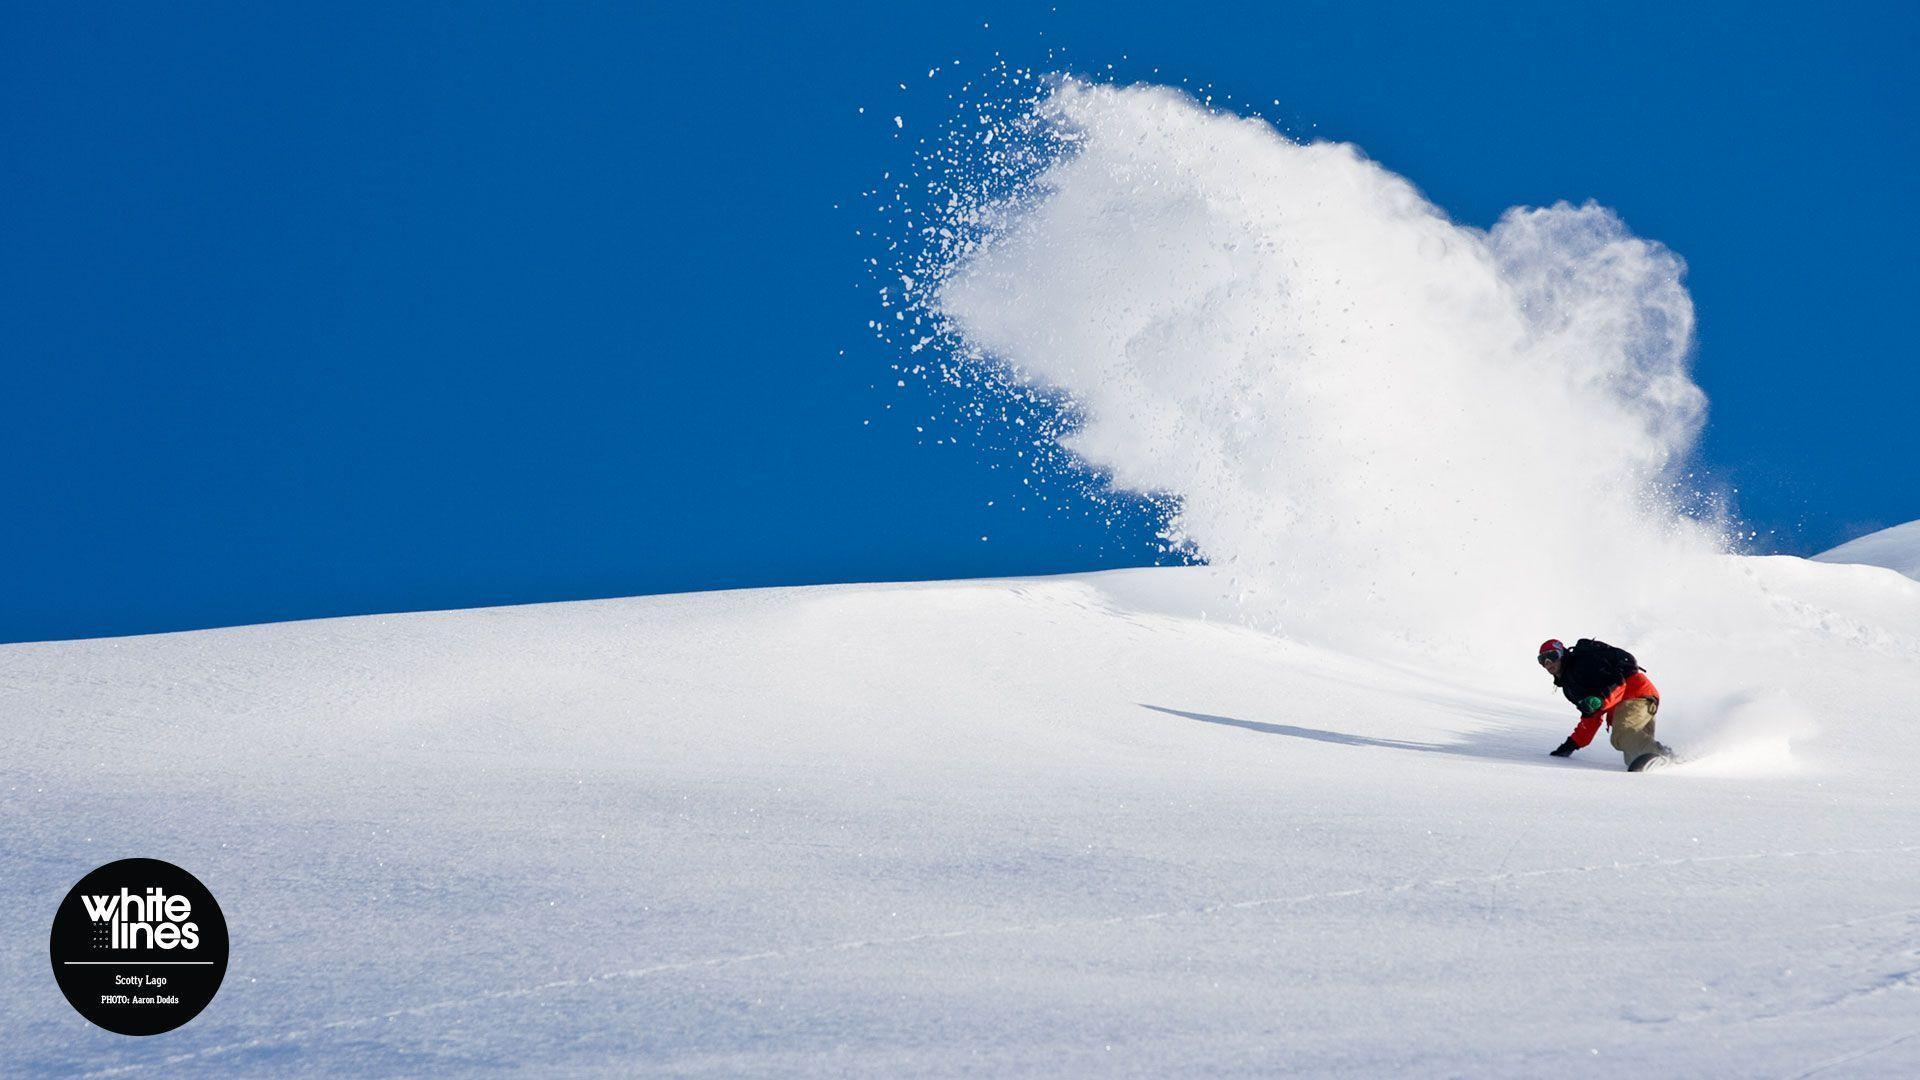 snowboarding wallpapers wallpaper - photo #2